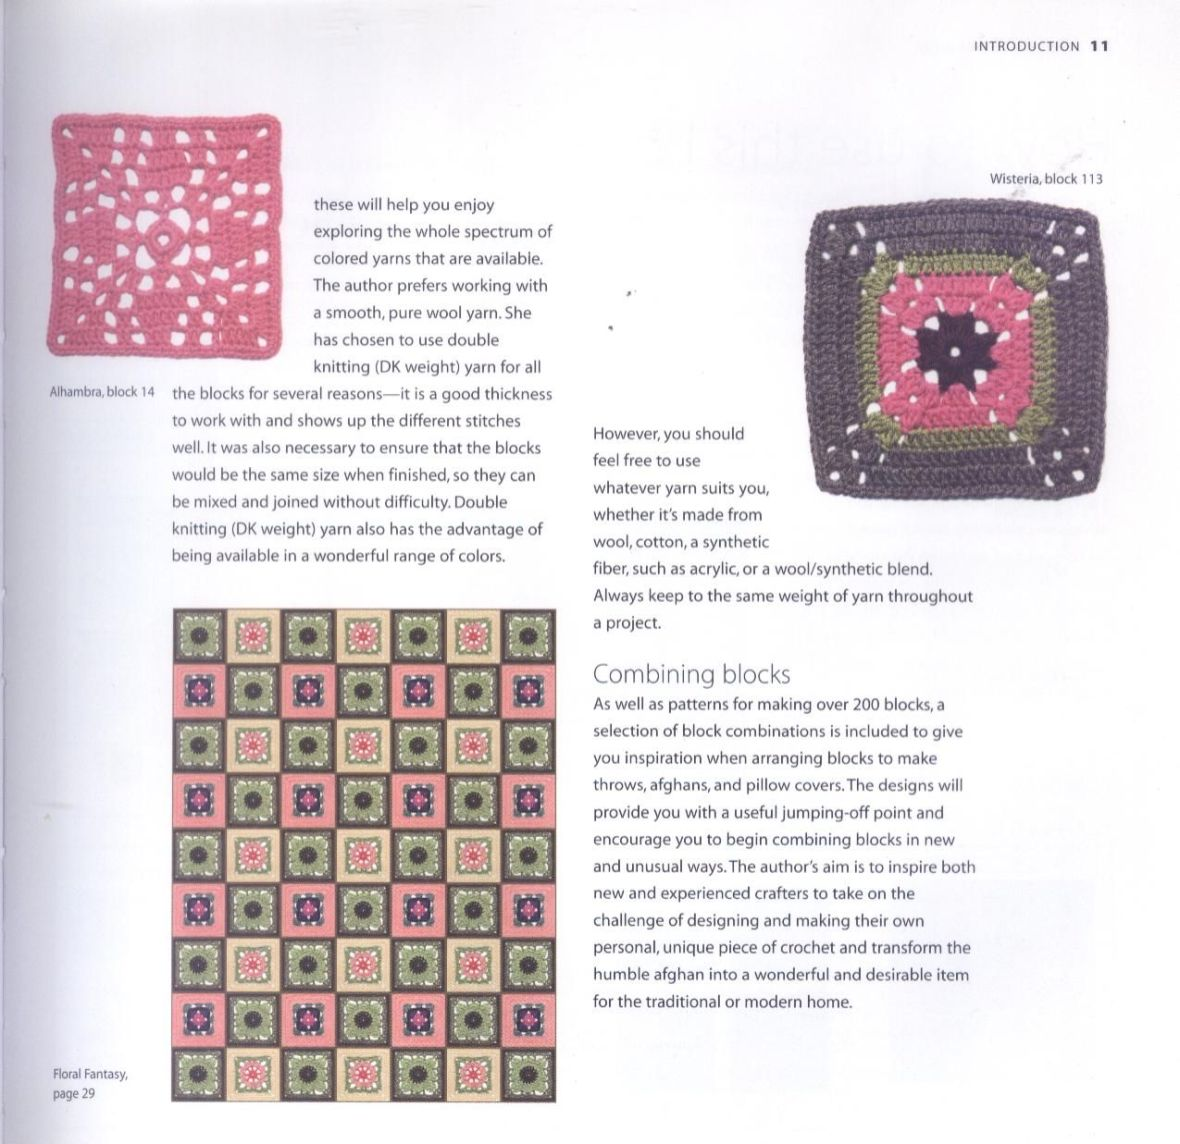 200 Crocheted Blocks for blankets, throws & Afghans 011